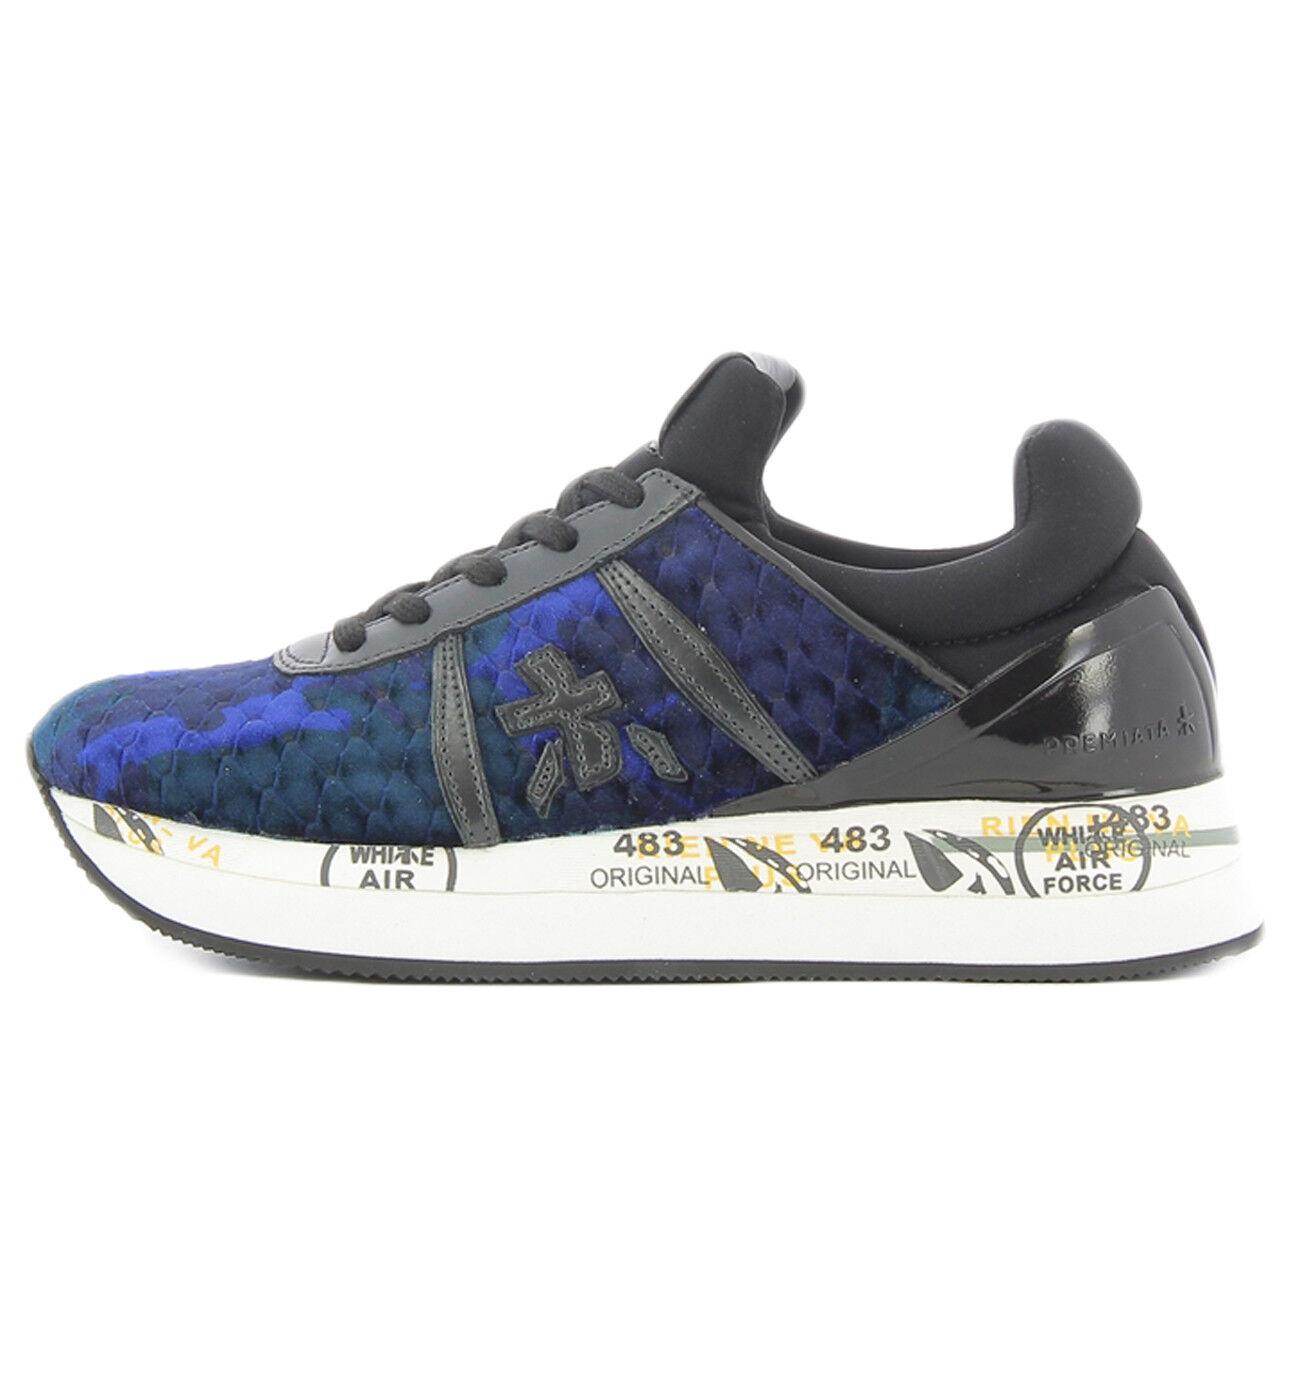 Premiata Liz 3354 scarpe da ginnastica en néoprène blu et et et velours pour Donna  Premiata LIZ335 e98719